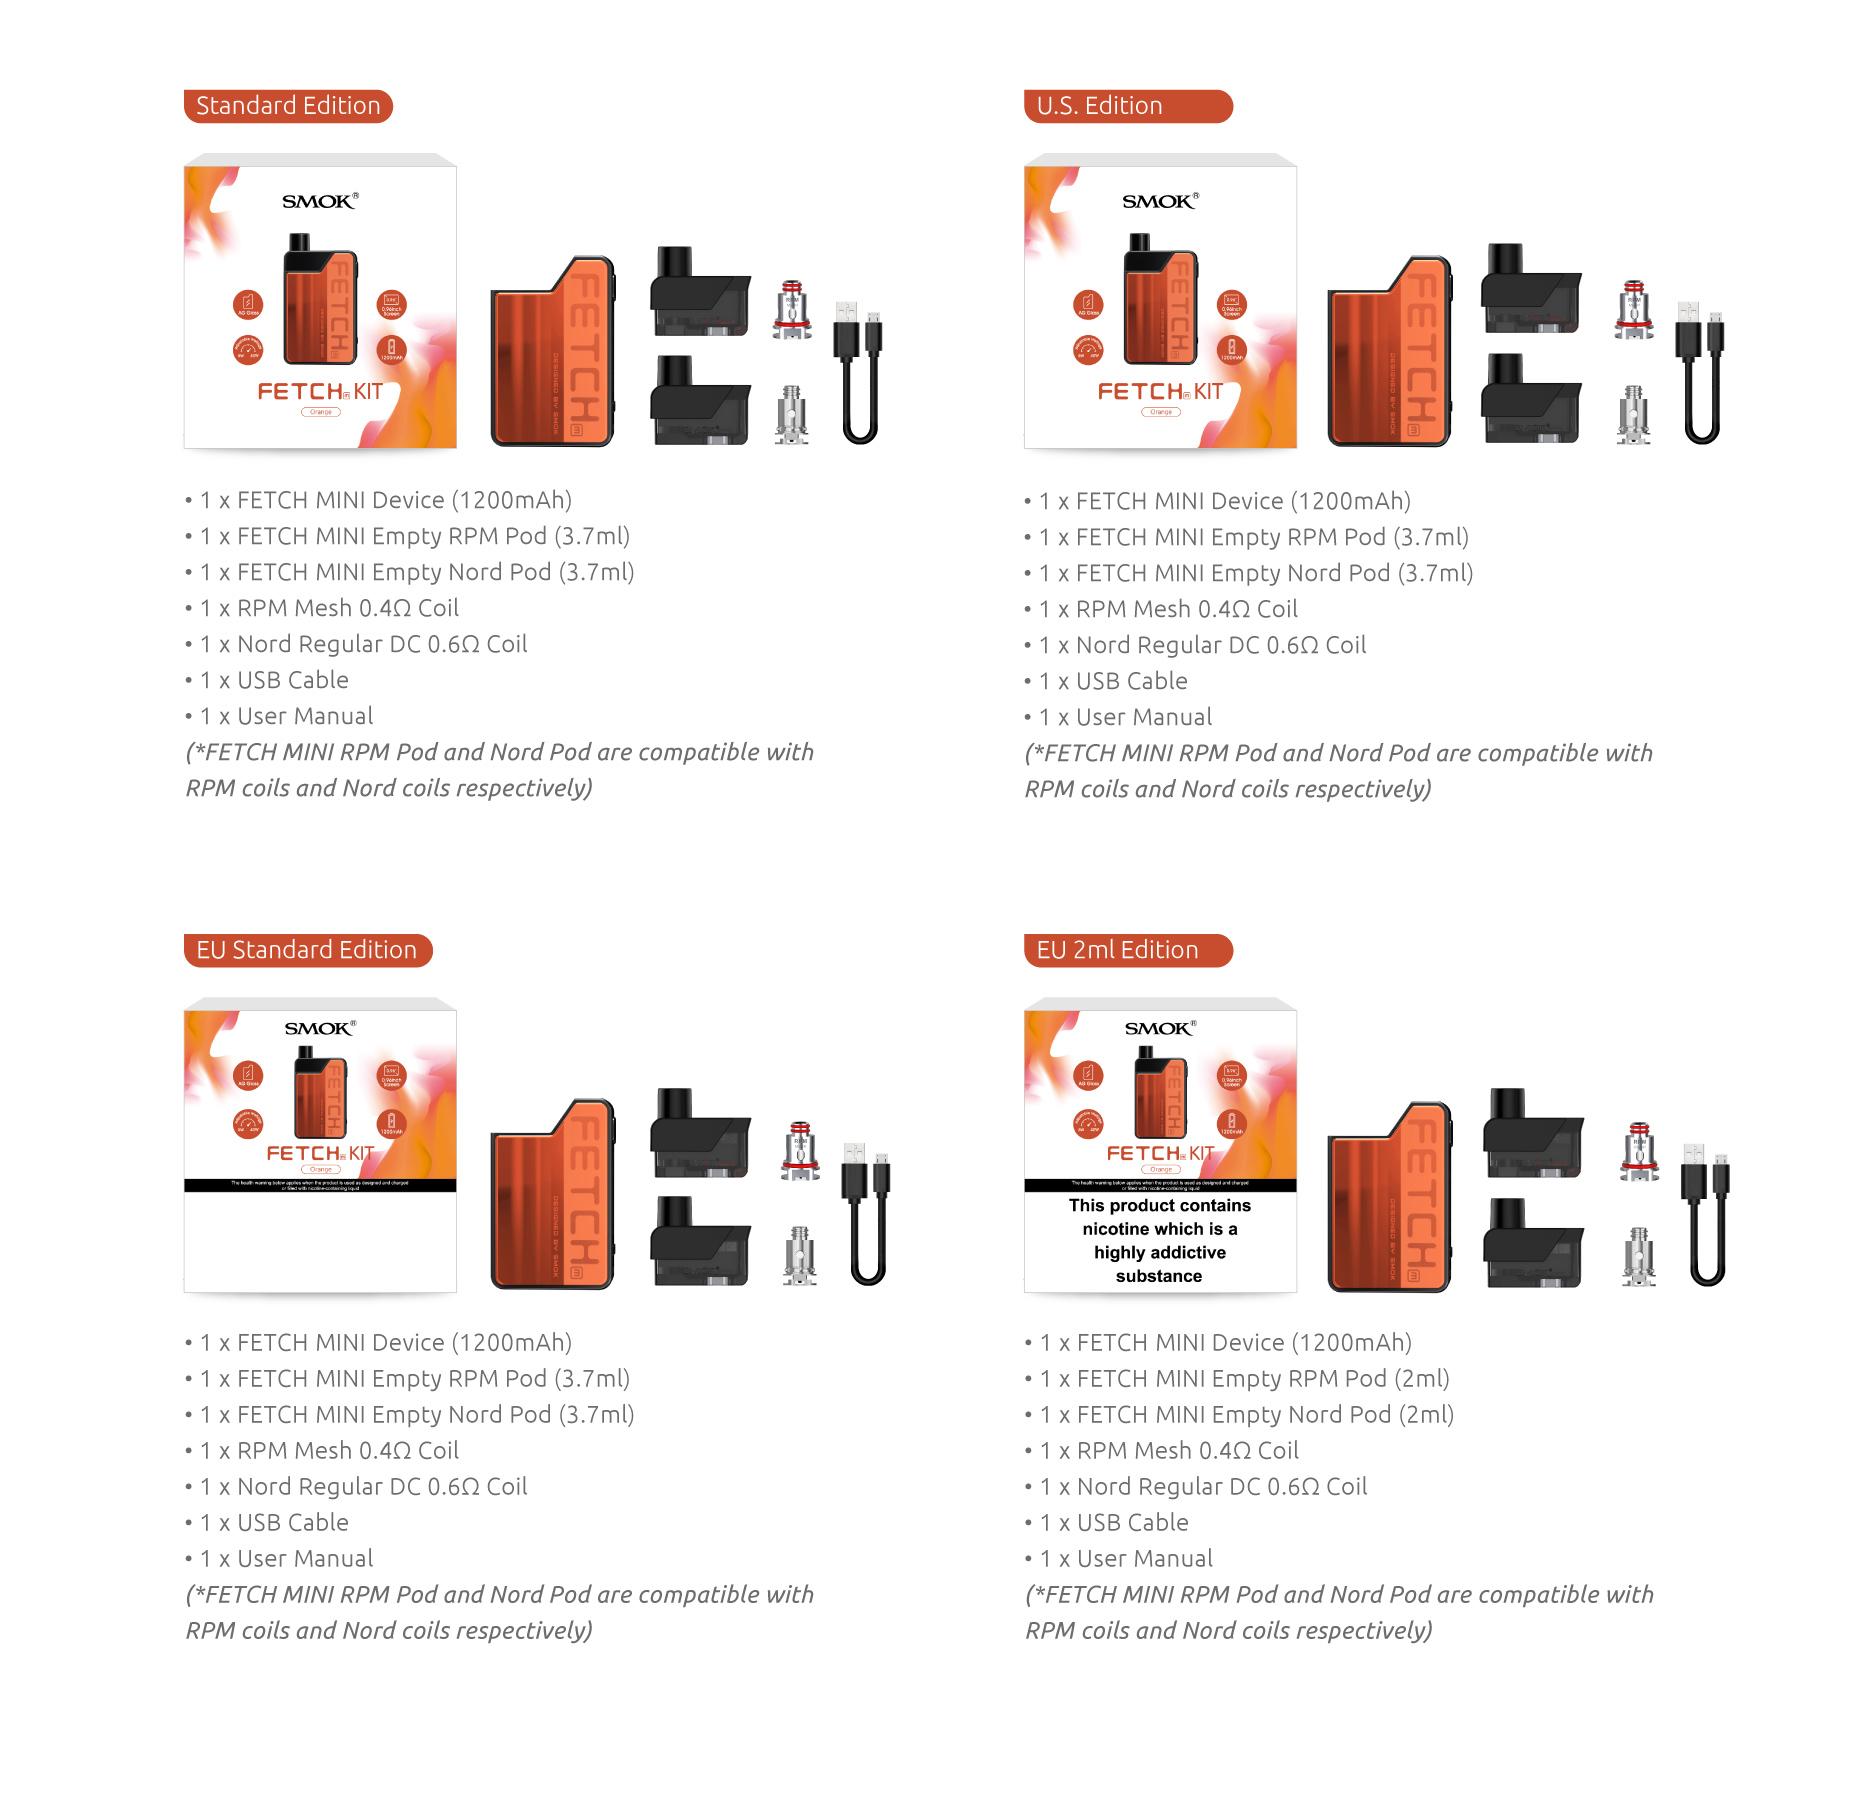 4 Editions of SMOK Fetch Mini